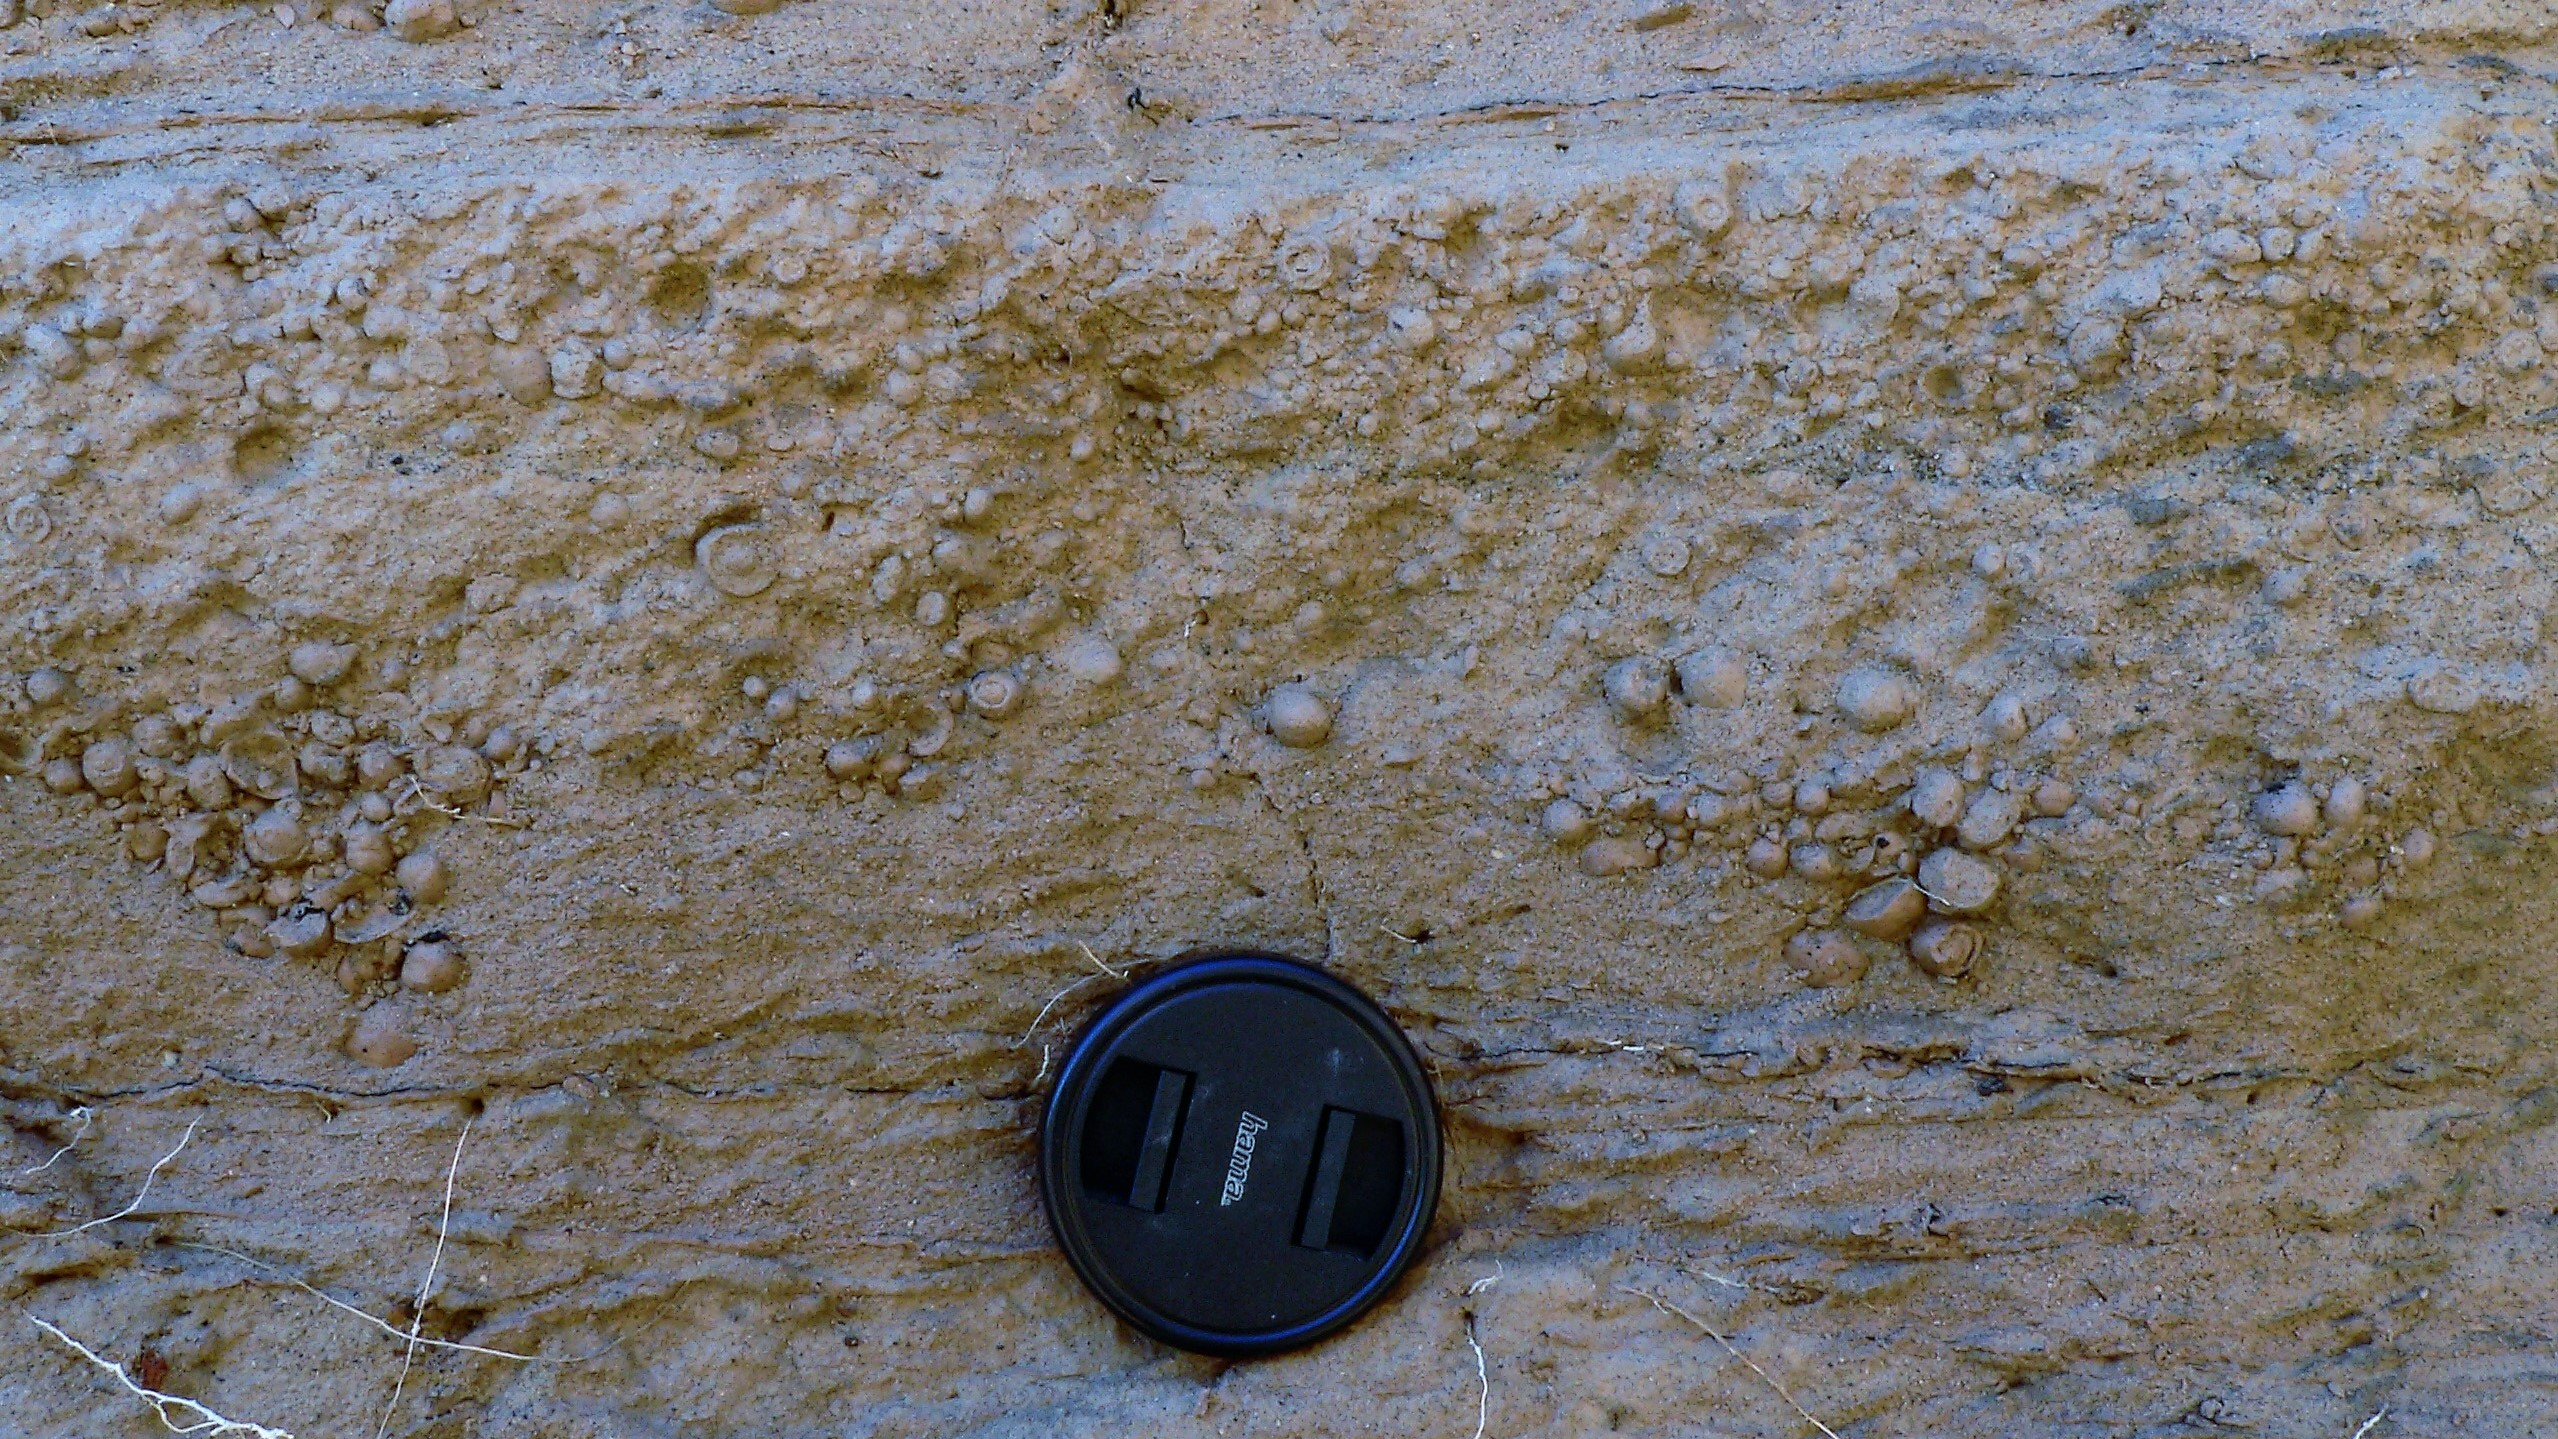 Accretionary lapilli from phreatoplinian air fall deposits, Oruanui eruption, New Zealand